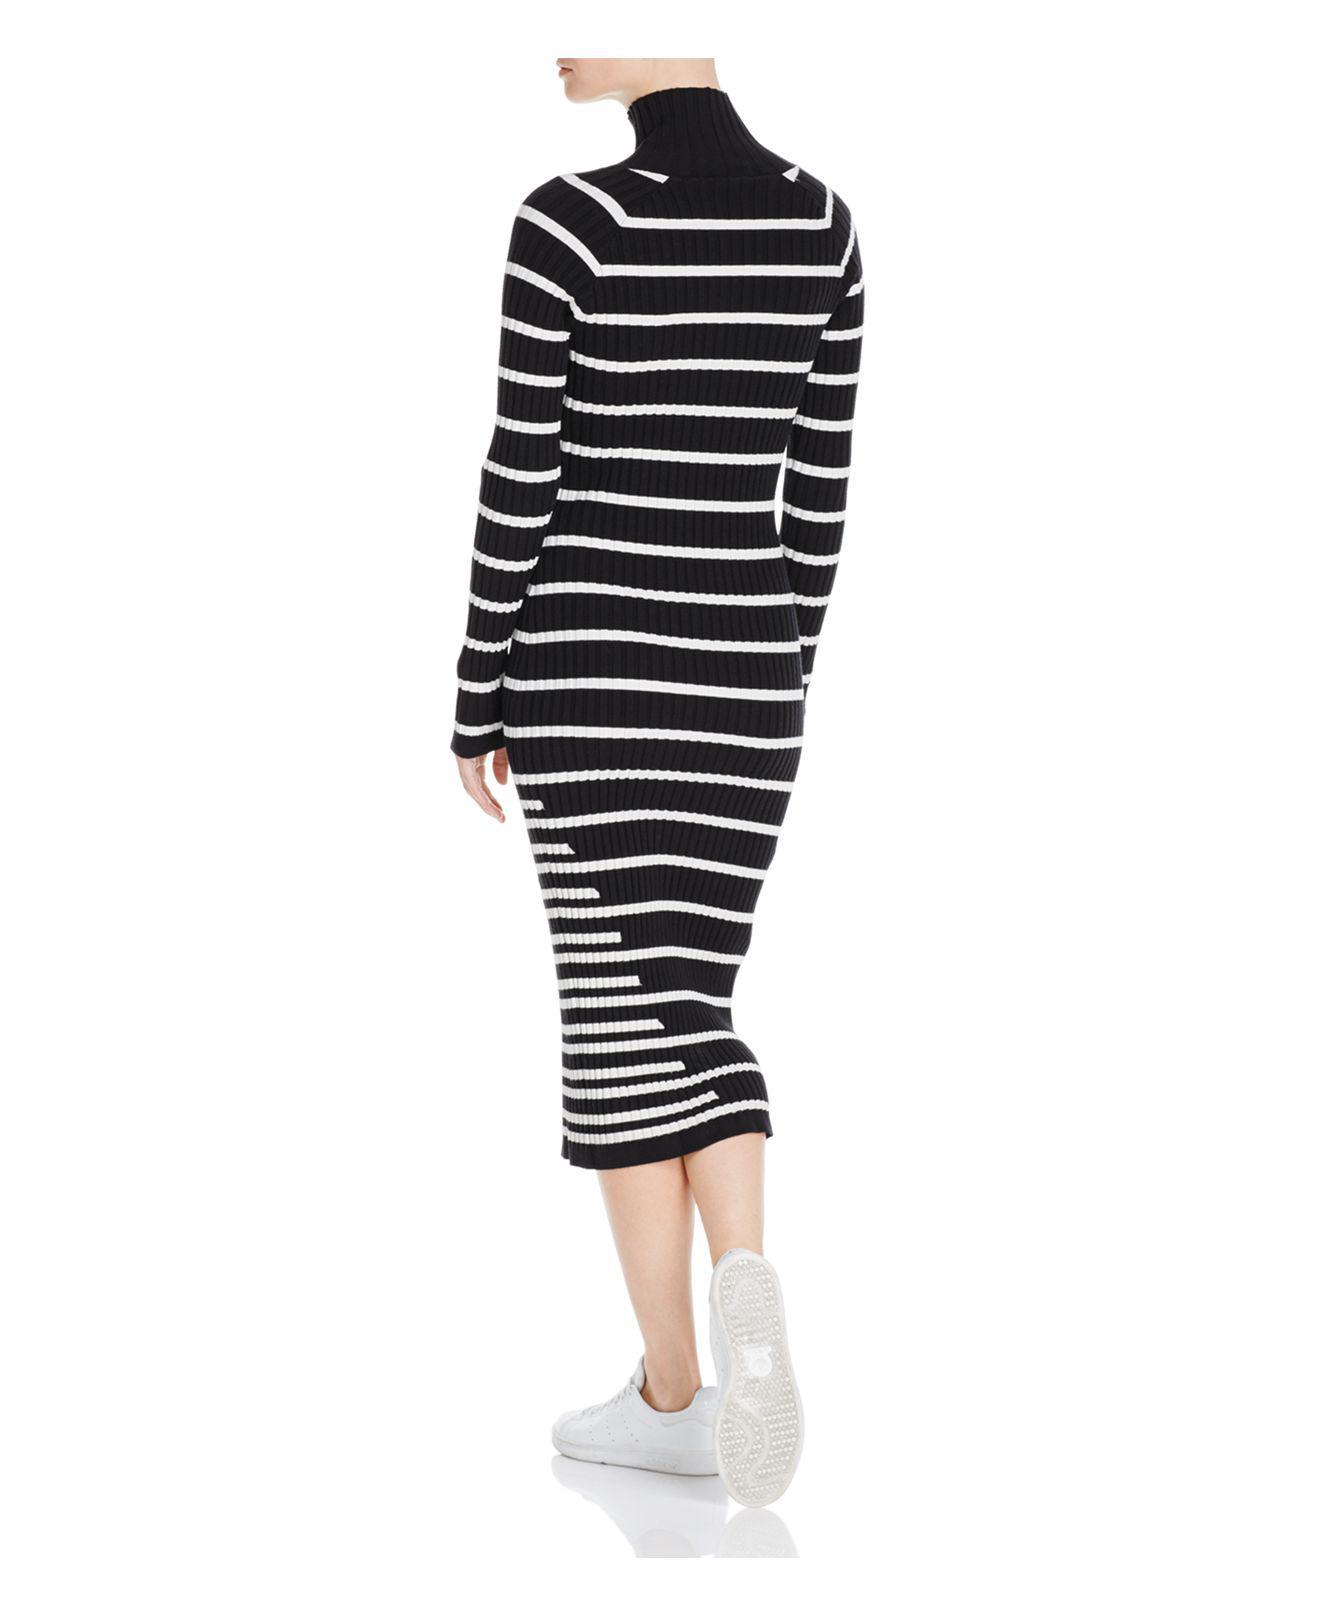 c291128b46 T By Alexander Wang Striped Body-con Sweater Dress in Black - Lyst